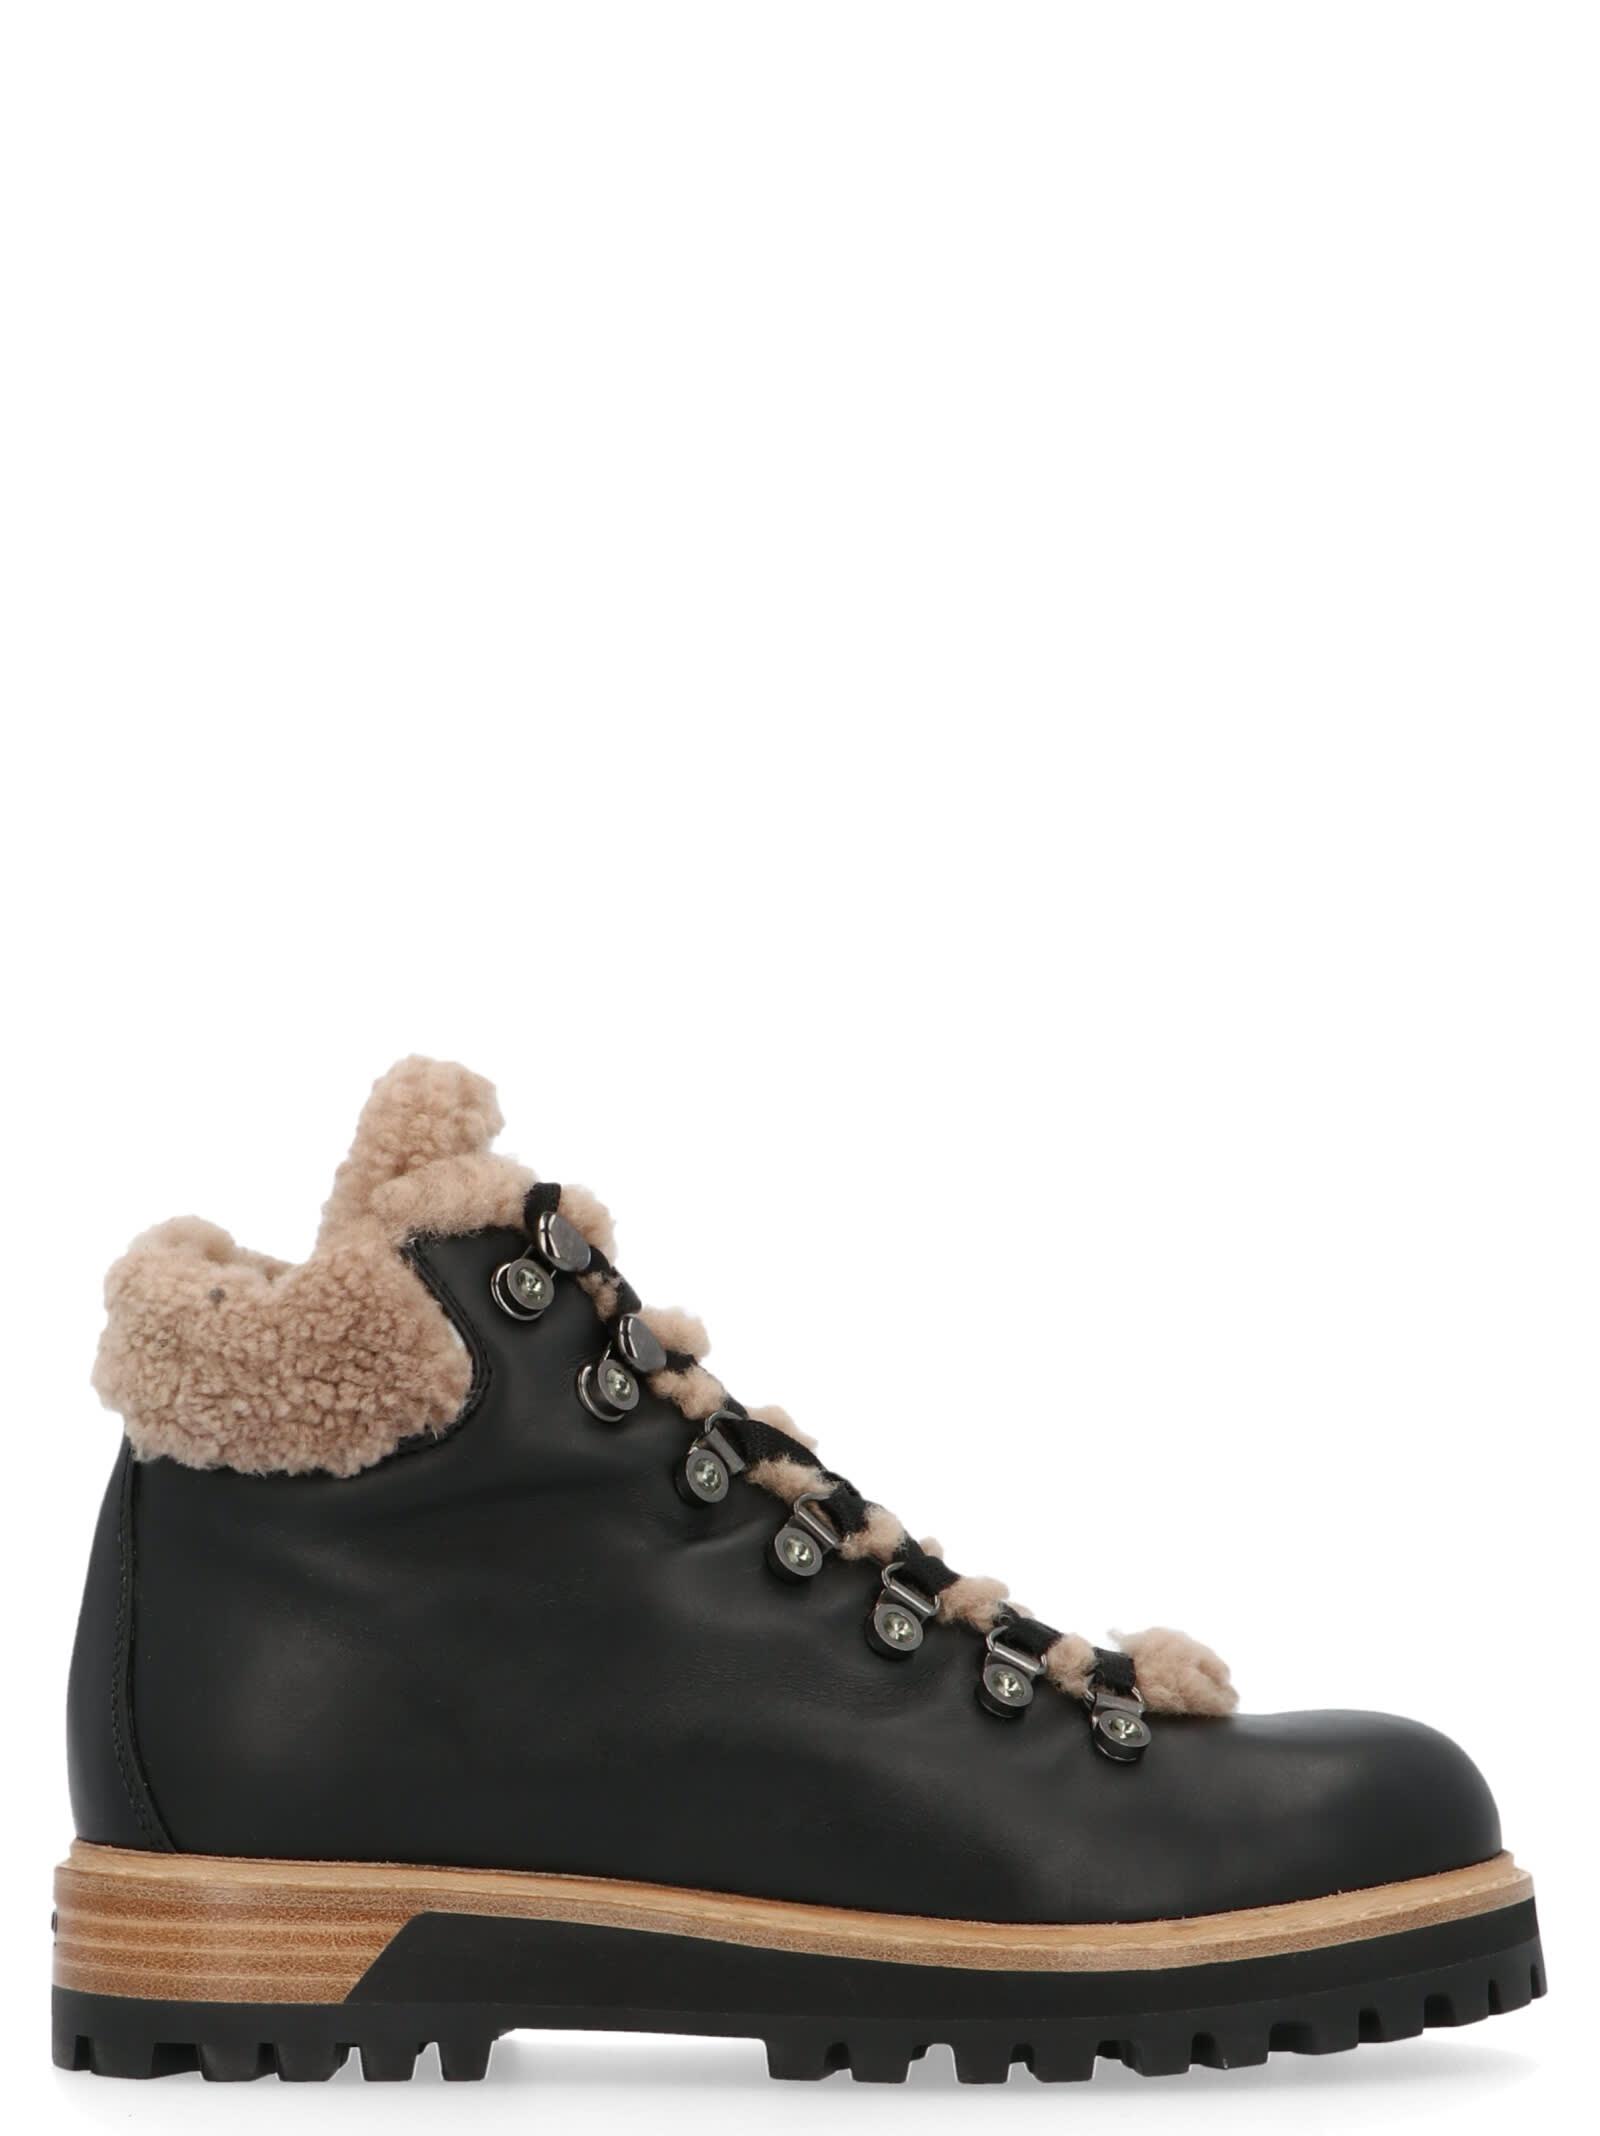 Le Silla St. Moritz Shoes In Black